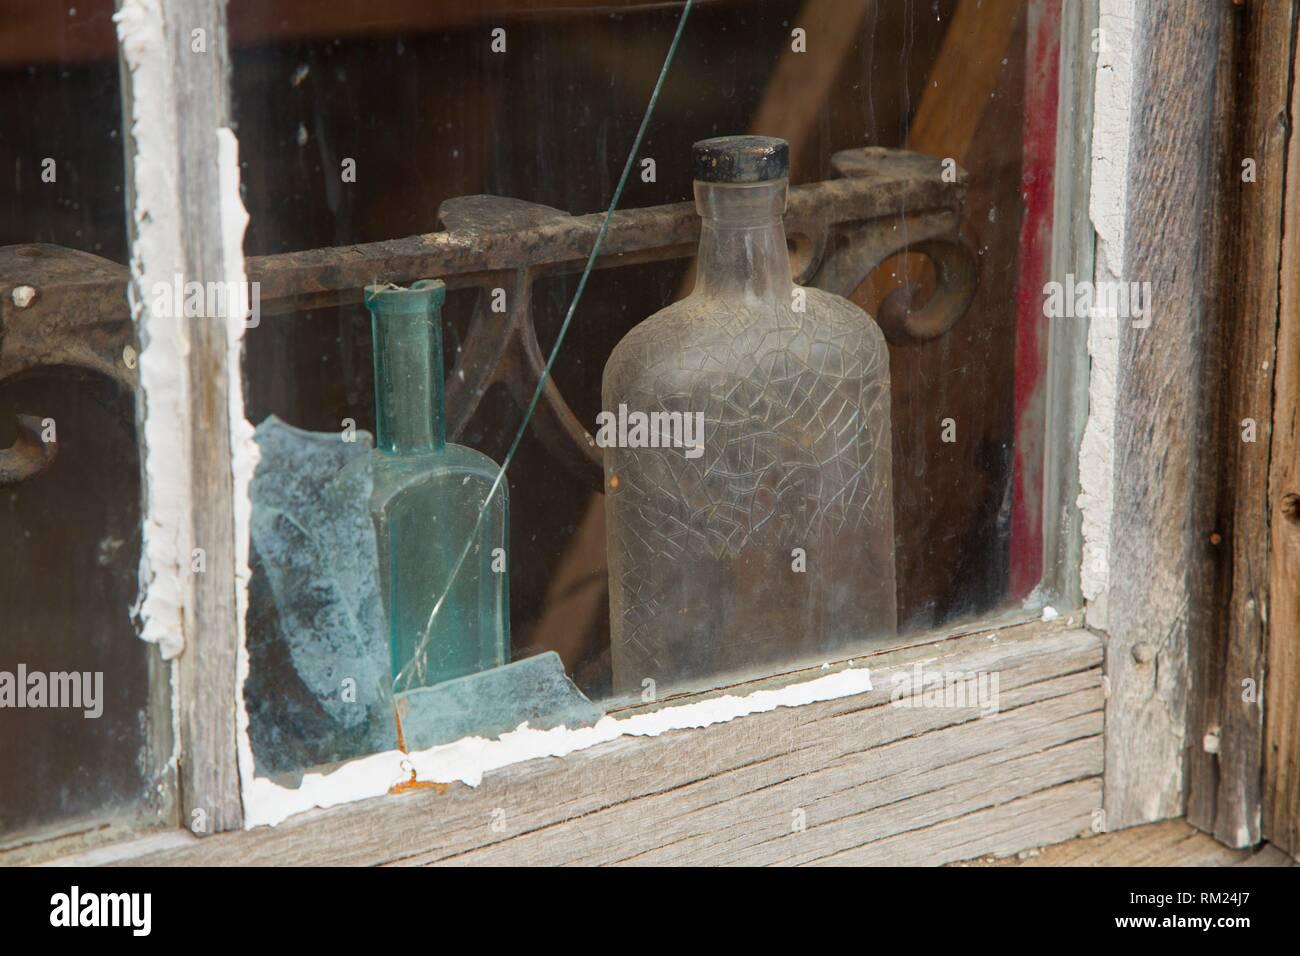 La sig.ra Phillips Home finestra, Berlin-Icthyosaur parco statale, Nevada. Immagini Stock